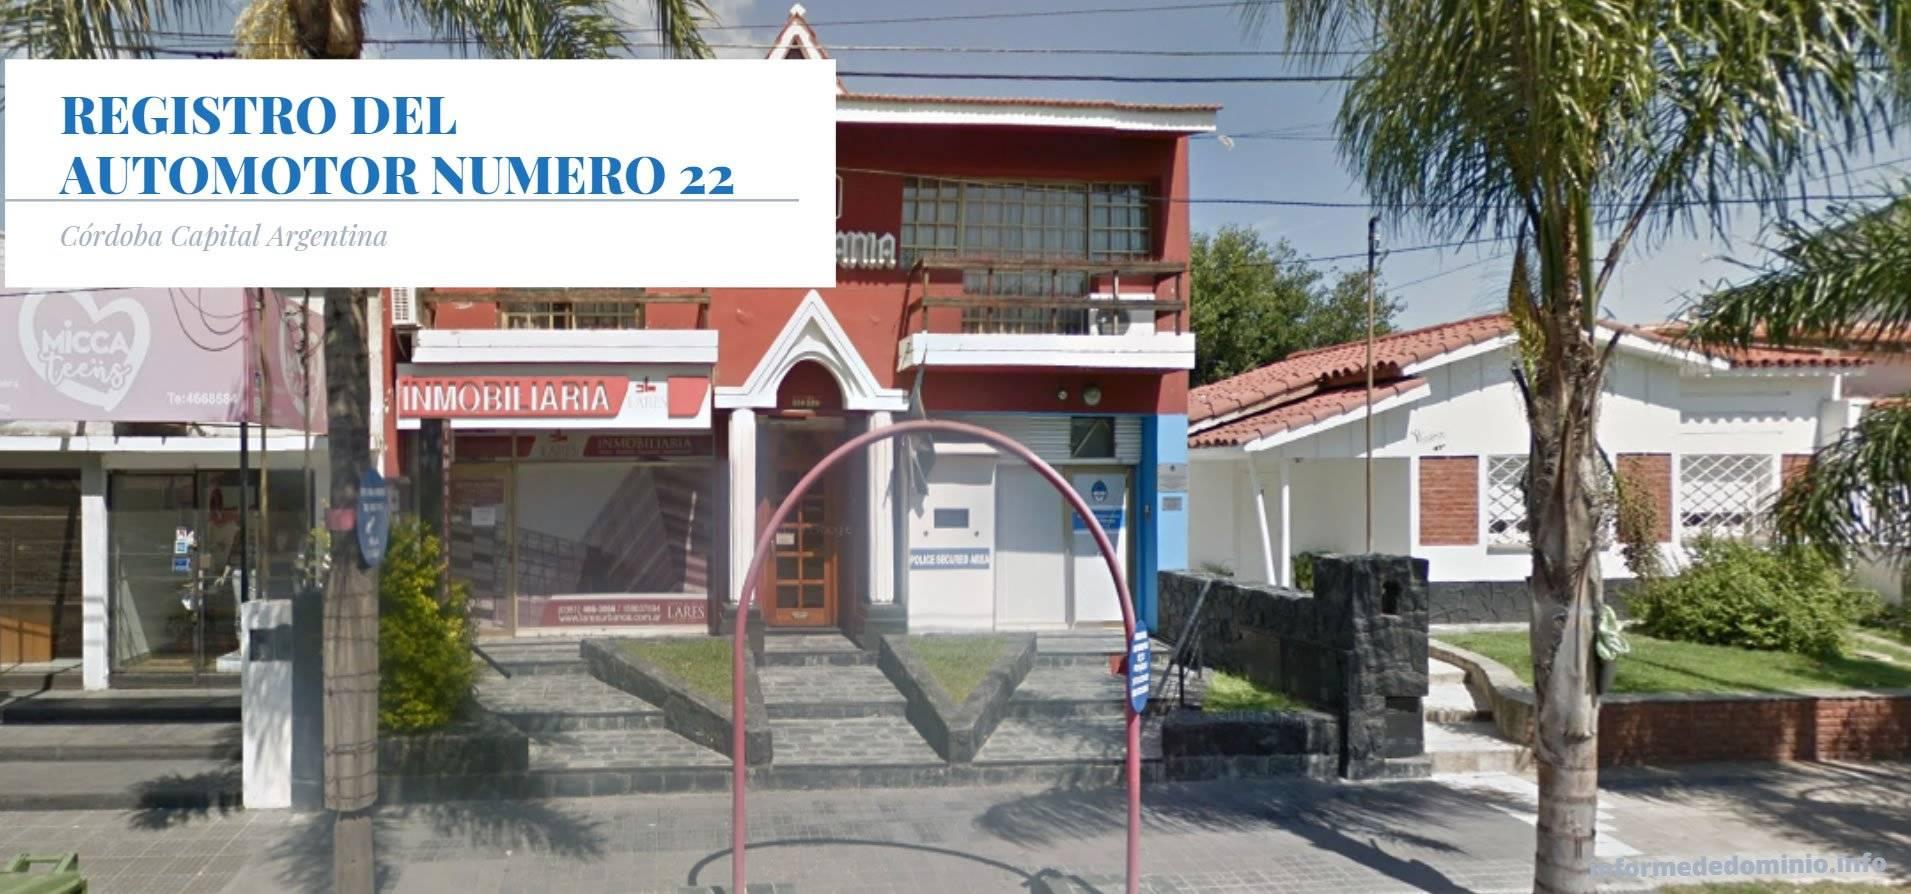 Registro Automotor Número 22 de Cordoba Capital